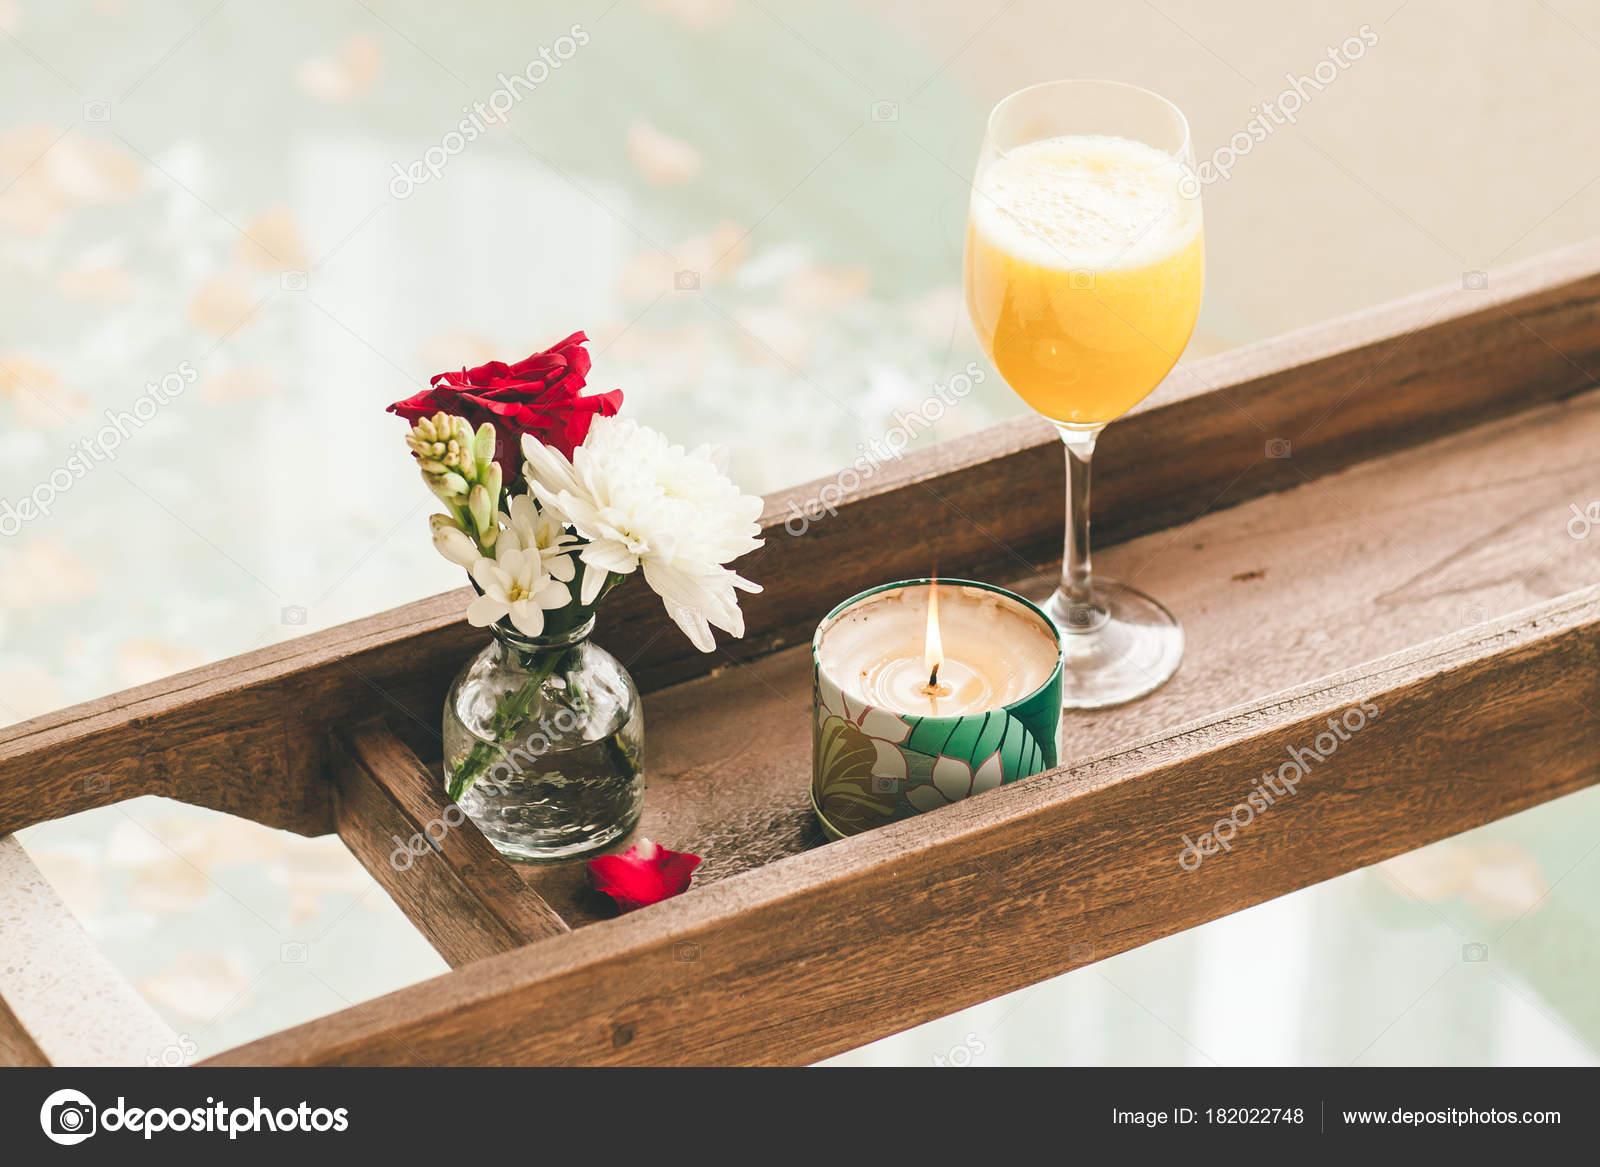 Vassoio Vasca Da Bagno : Bagno luminoso casa bagno con petali fiori sale vassoio sopra u2014 foto